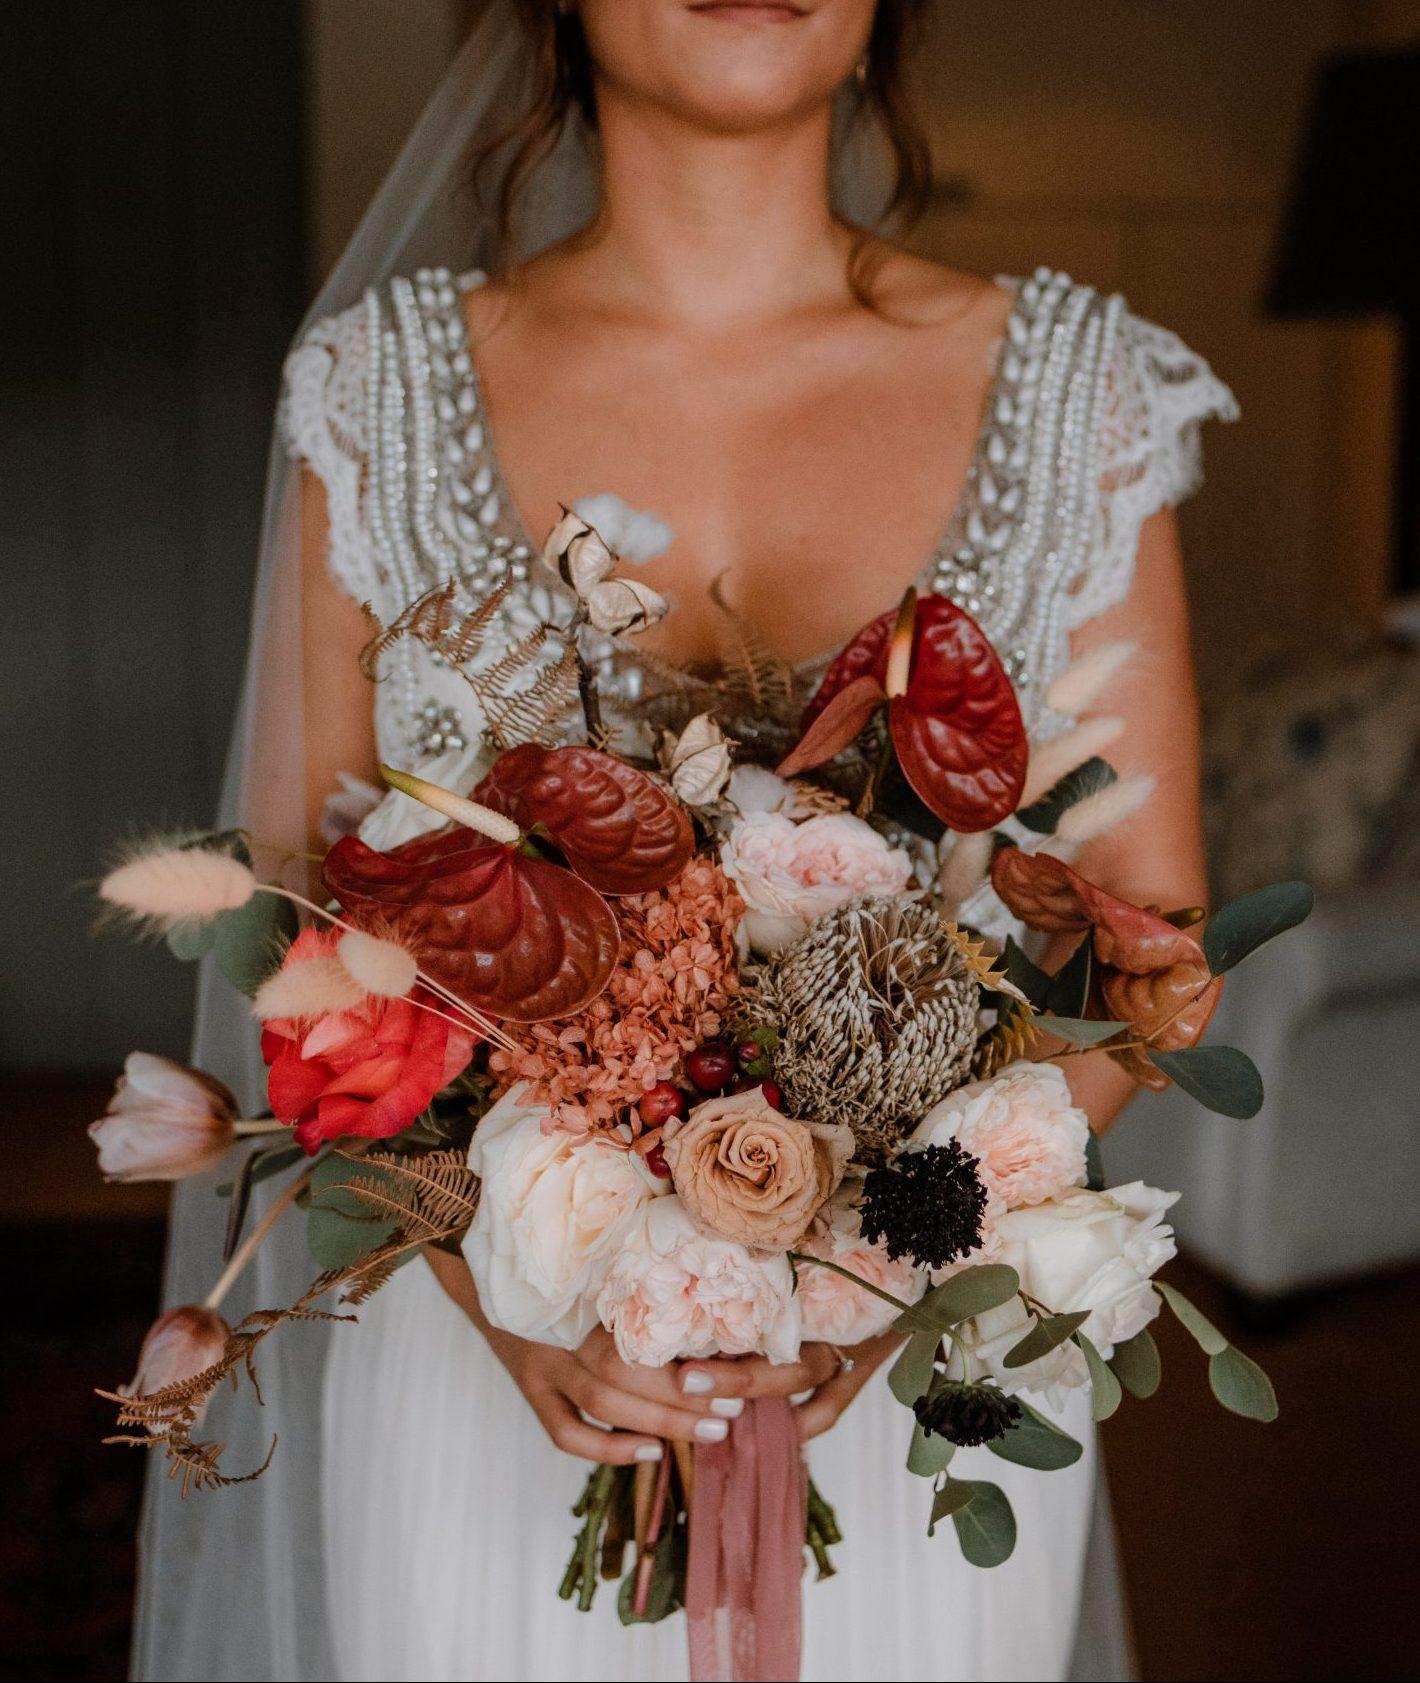 Bridal Bouquet - Hand-Tied Flower Heavy